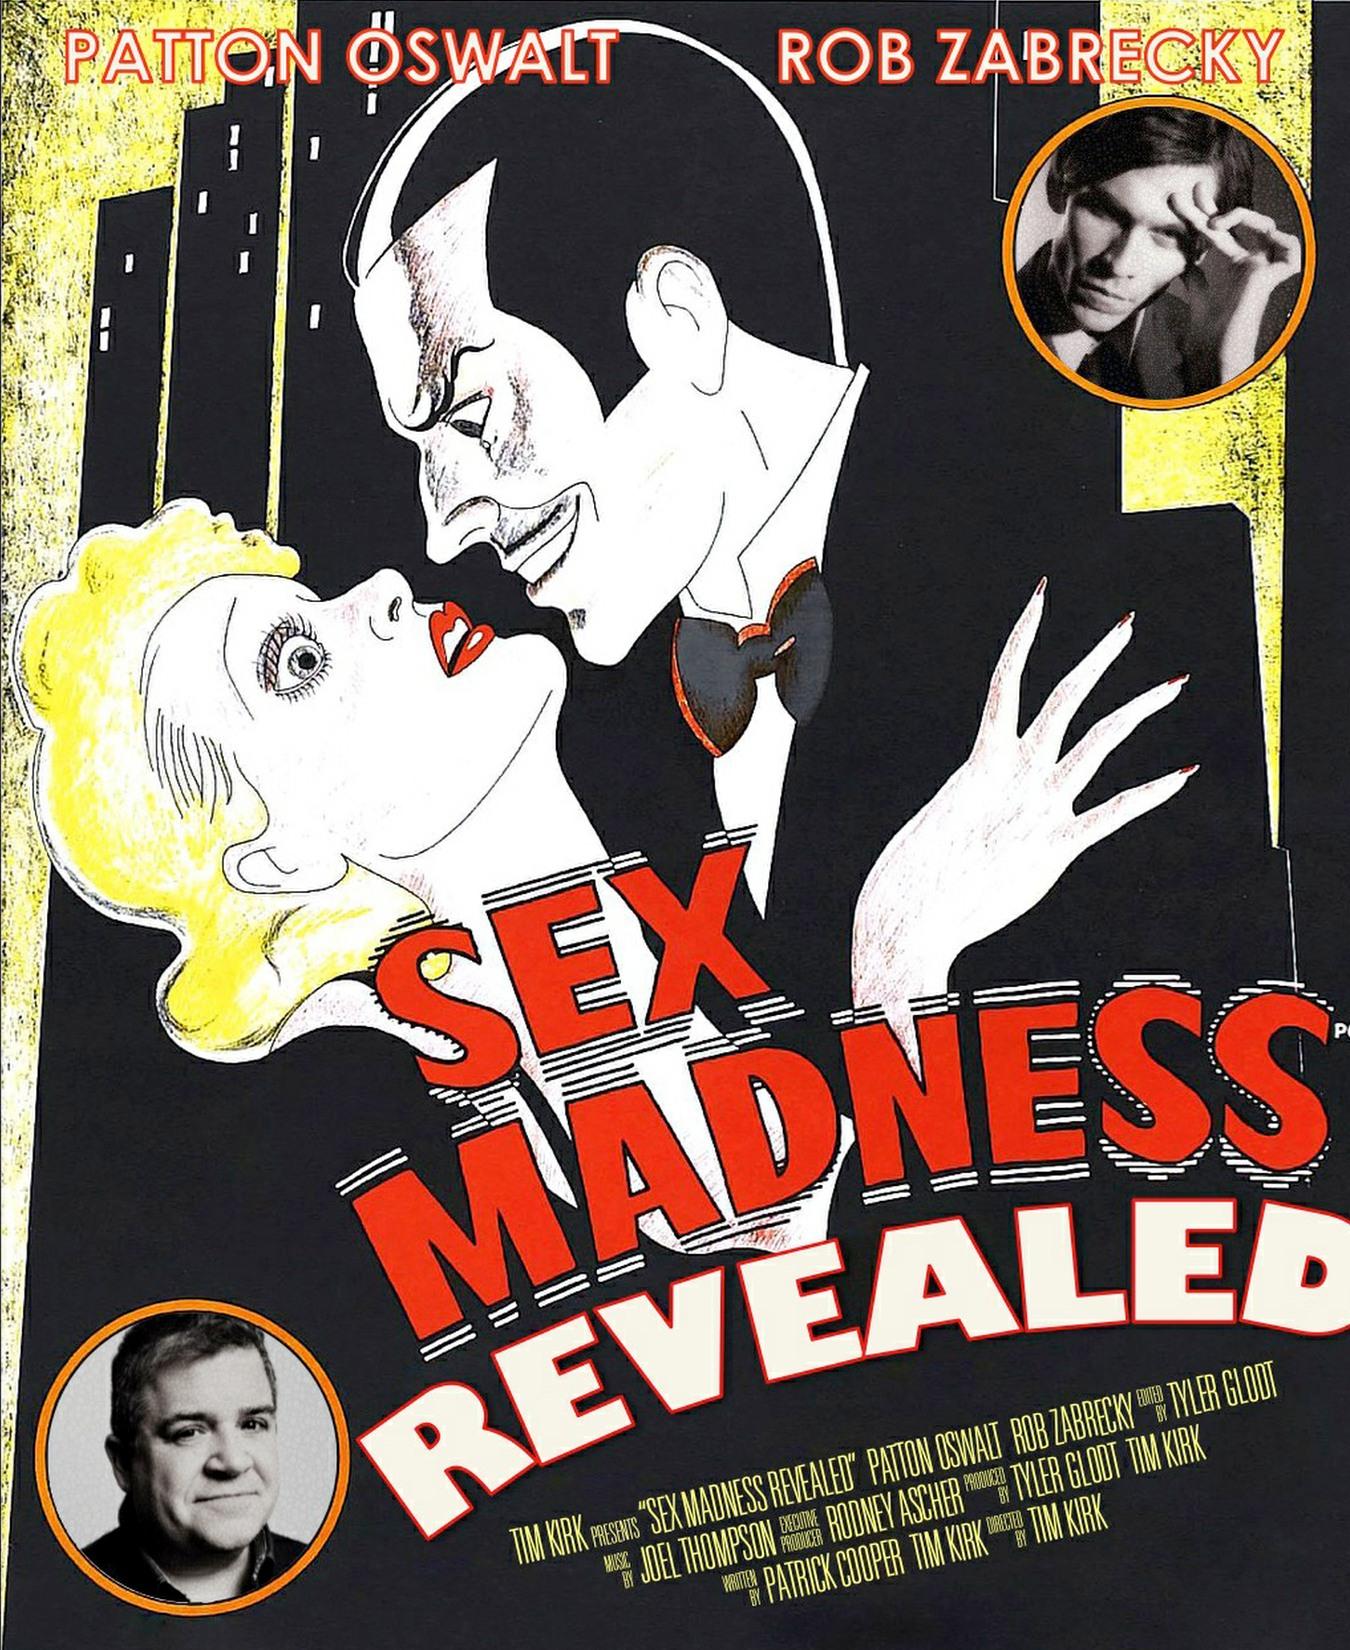 Sex Madness Revealed Poster-trimmed.jpg